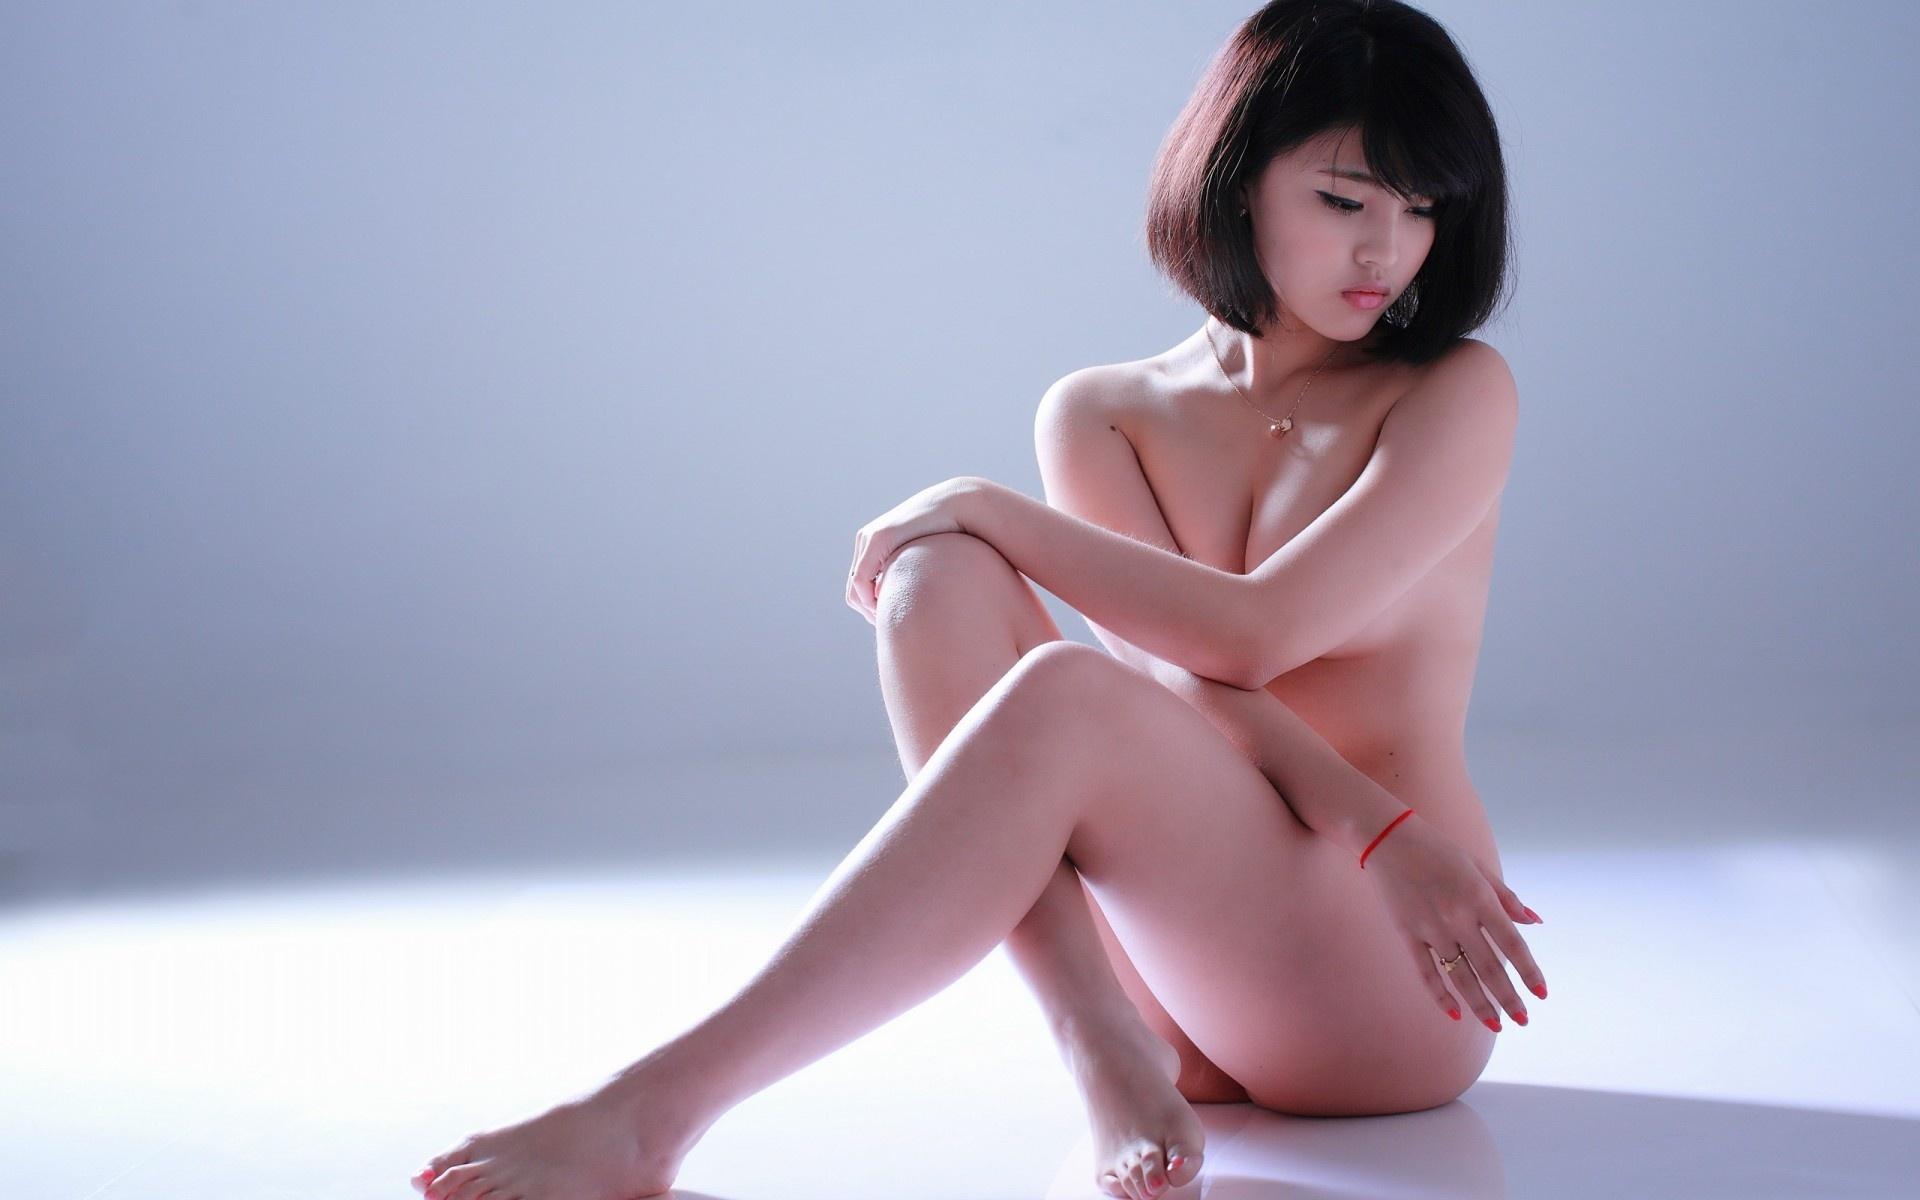 вообще вижу девушки фото азия эротика поцелуи, помнит